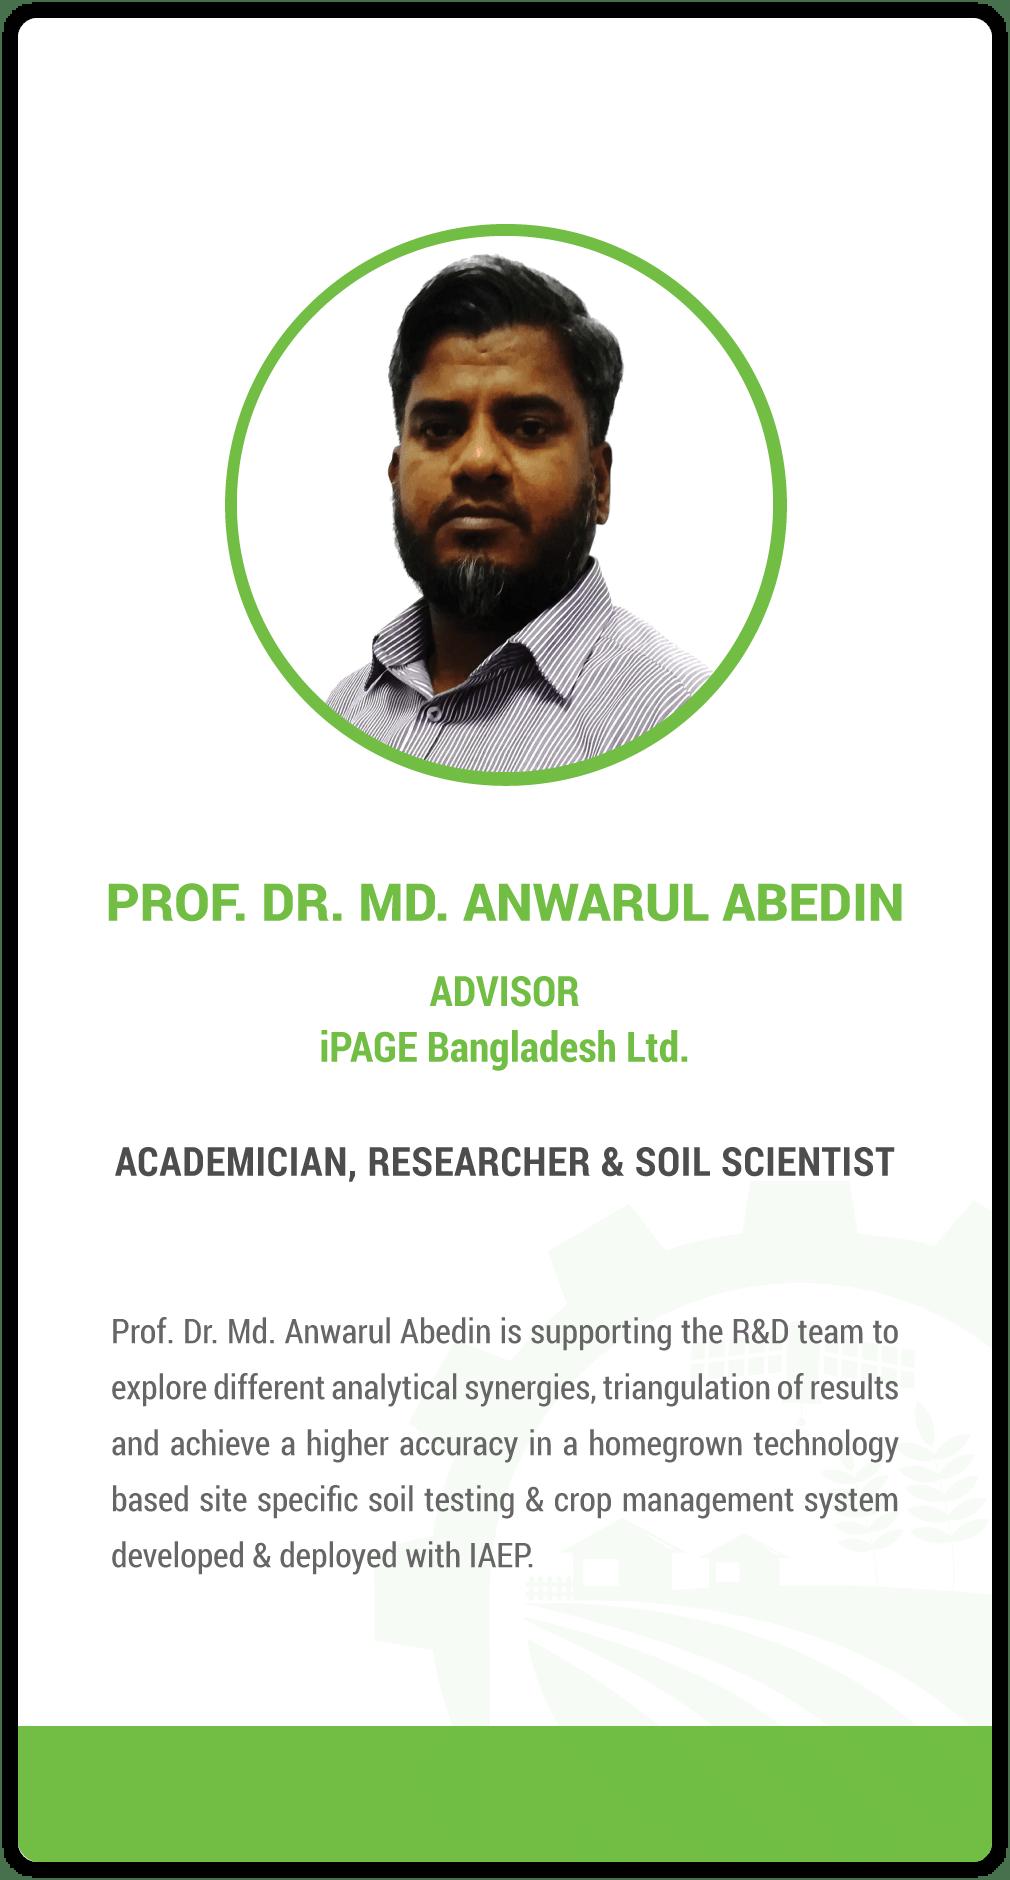 Anwarul Abedin